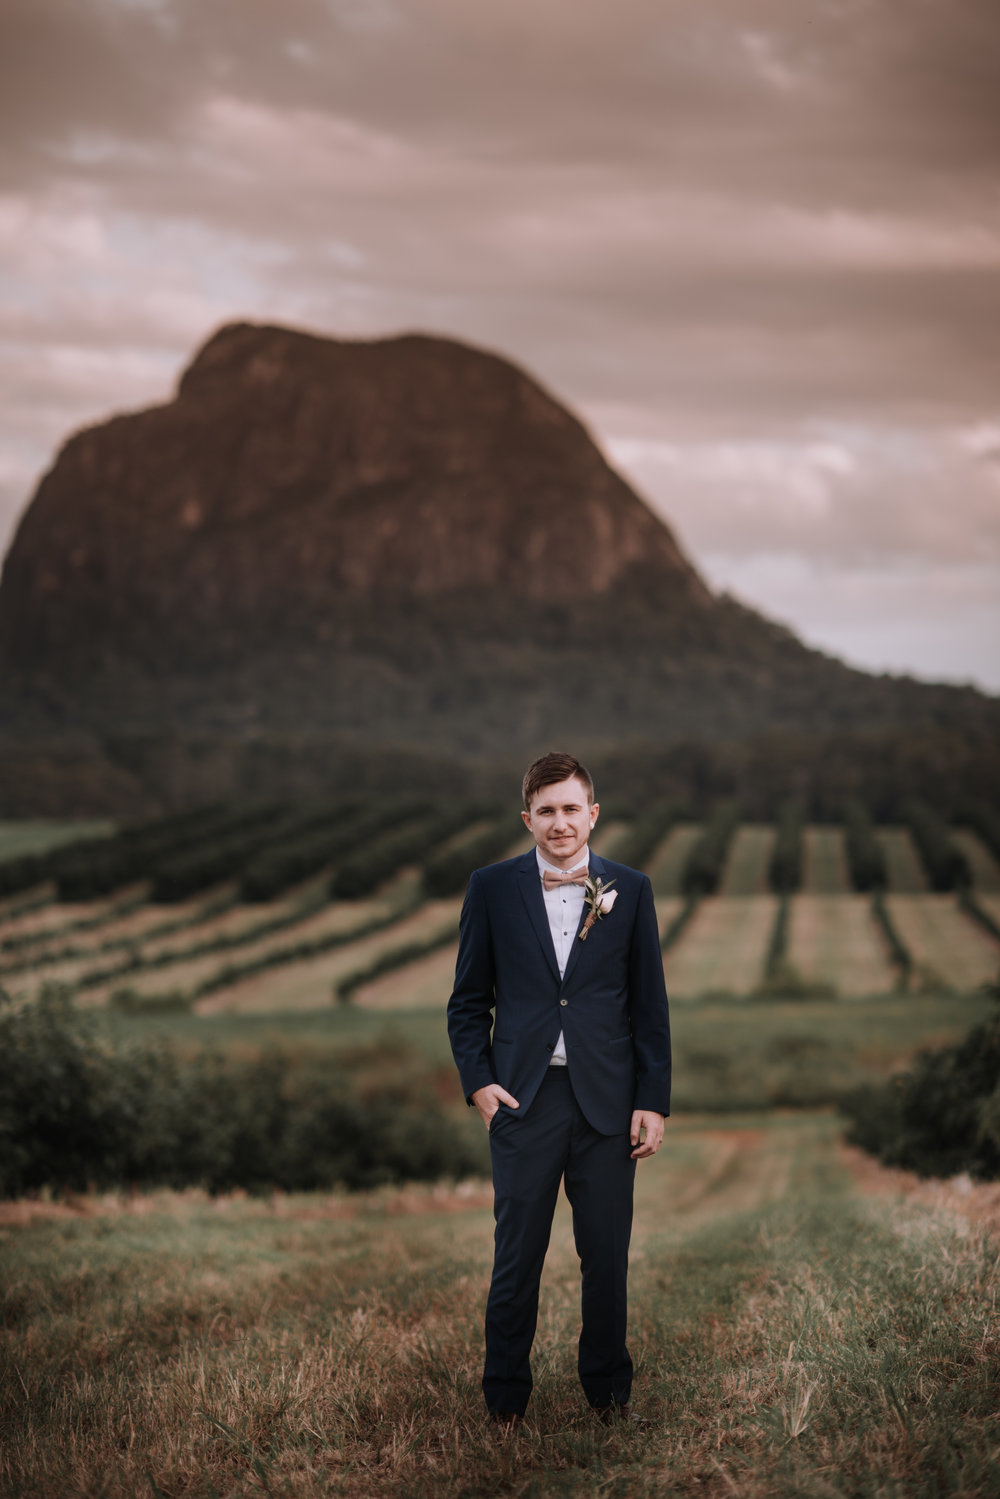 LOVELENSCAPES PHOTOGRAPHY •VISUAL POETRY • GLASSHOUSE MOUNTAINS • AUSTRALIAN WEDDING PHOTOGRAPHER • SUNSHINE COAST WEDDING PHOTOGRAPHER • LUV BRIDAL • BEERWAH HIDEAWAY • 75.jpg